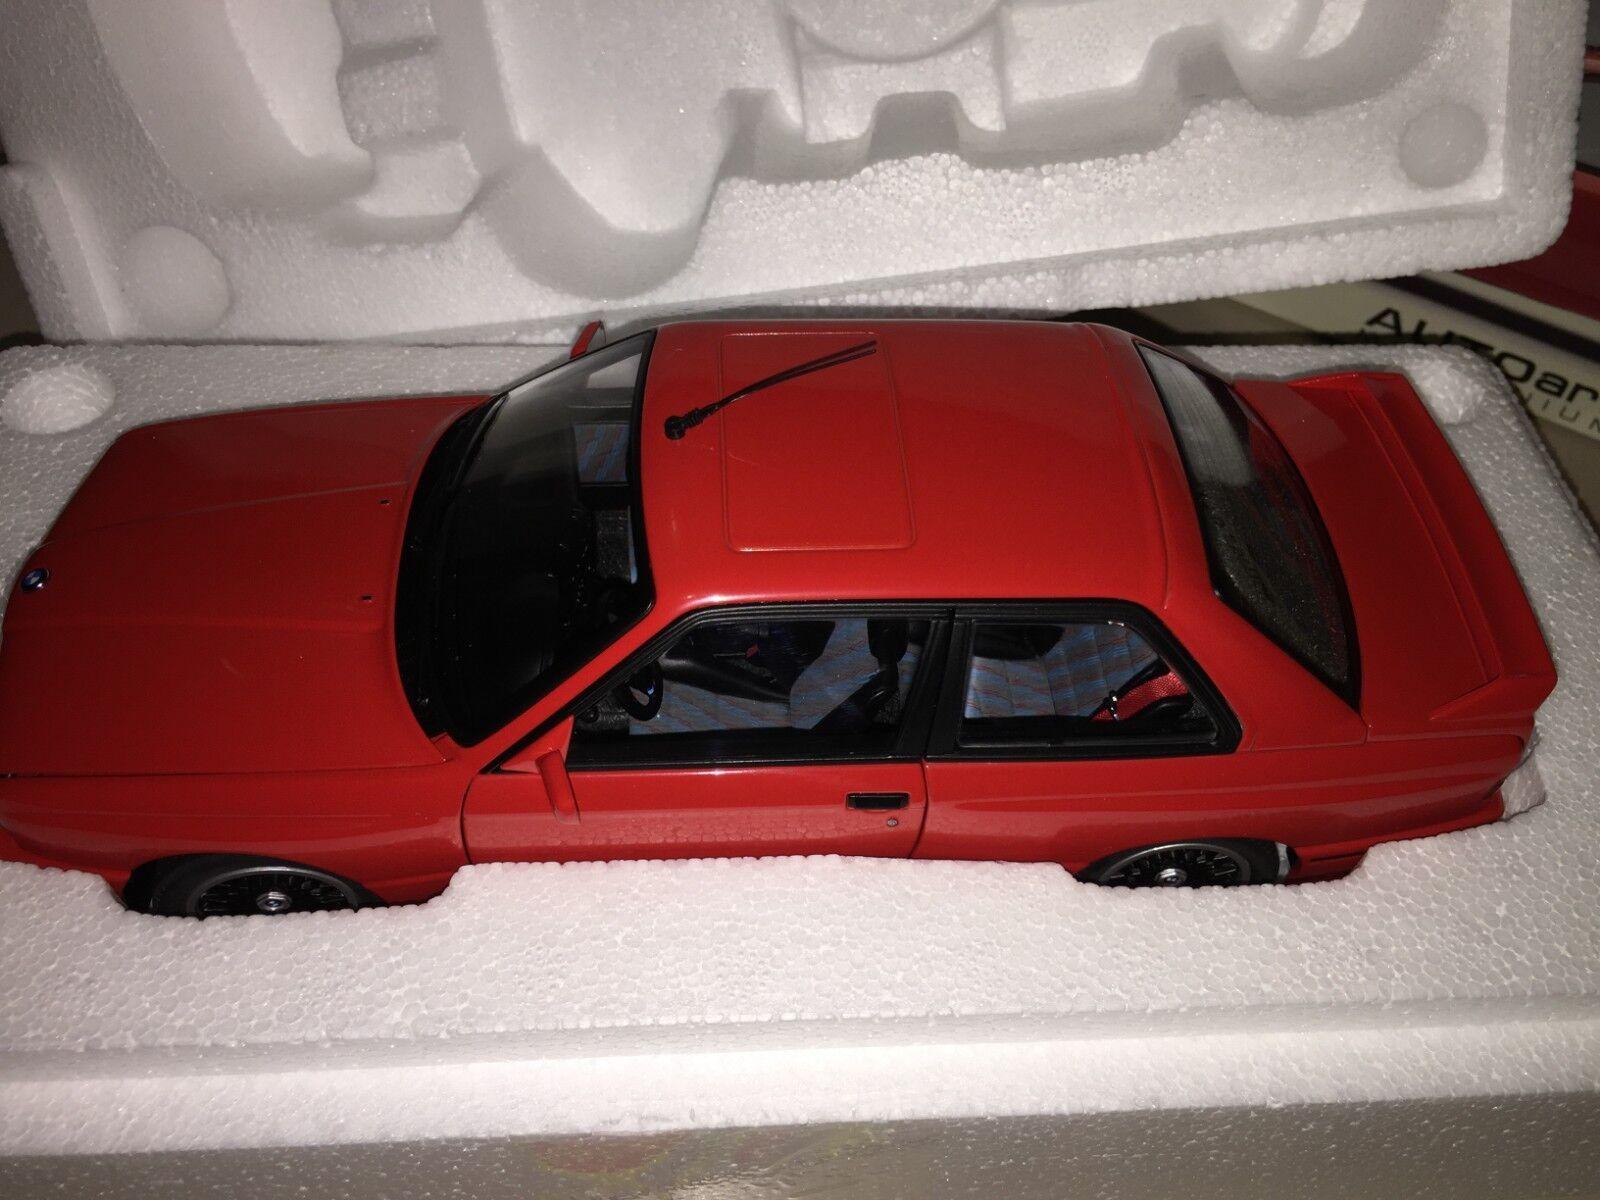 70566 AUTOART 1:18 BMW M3 E30 Rojo NEW  VERY RARE  FREE SHIPPING WORLDWIDE